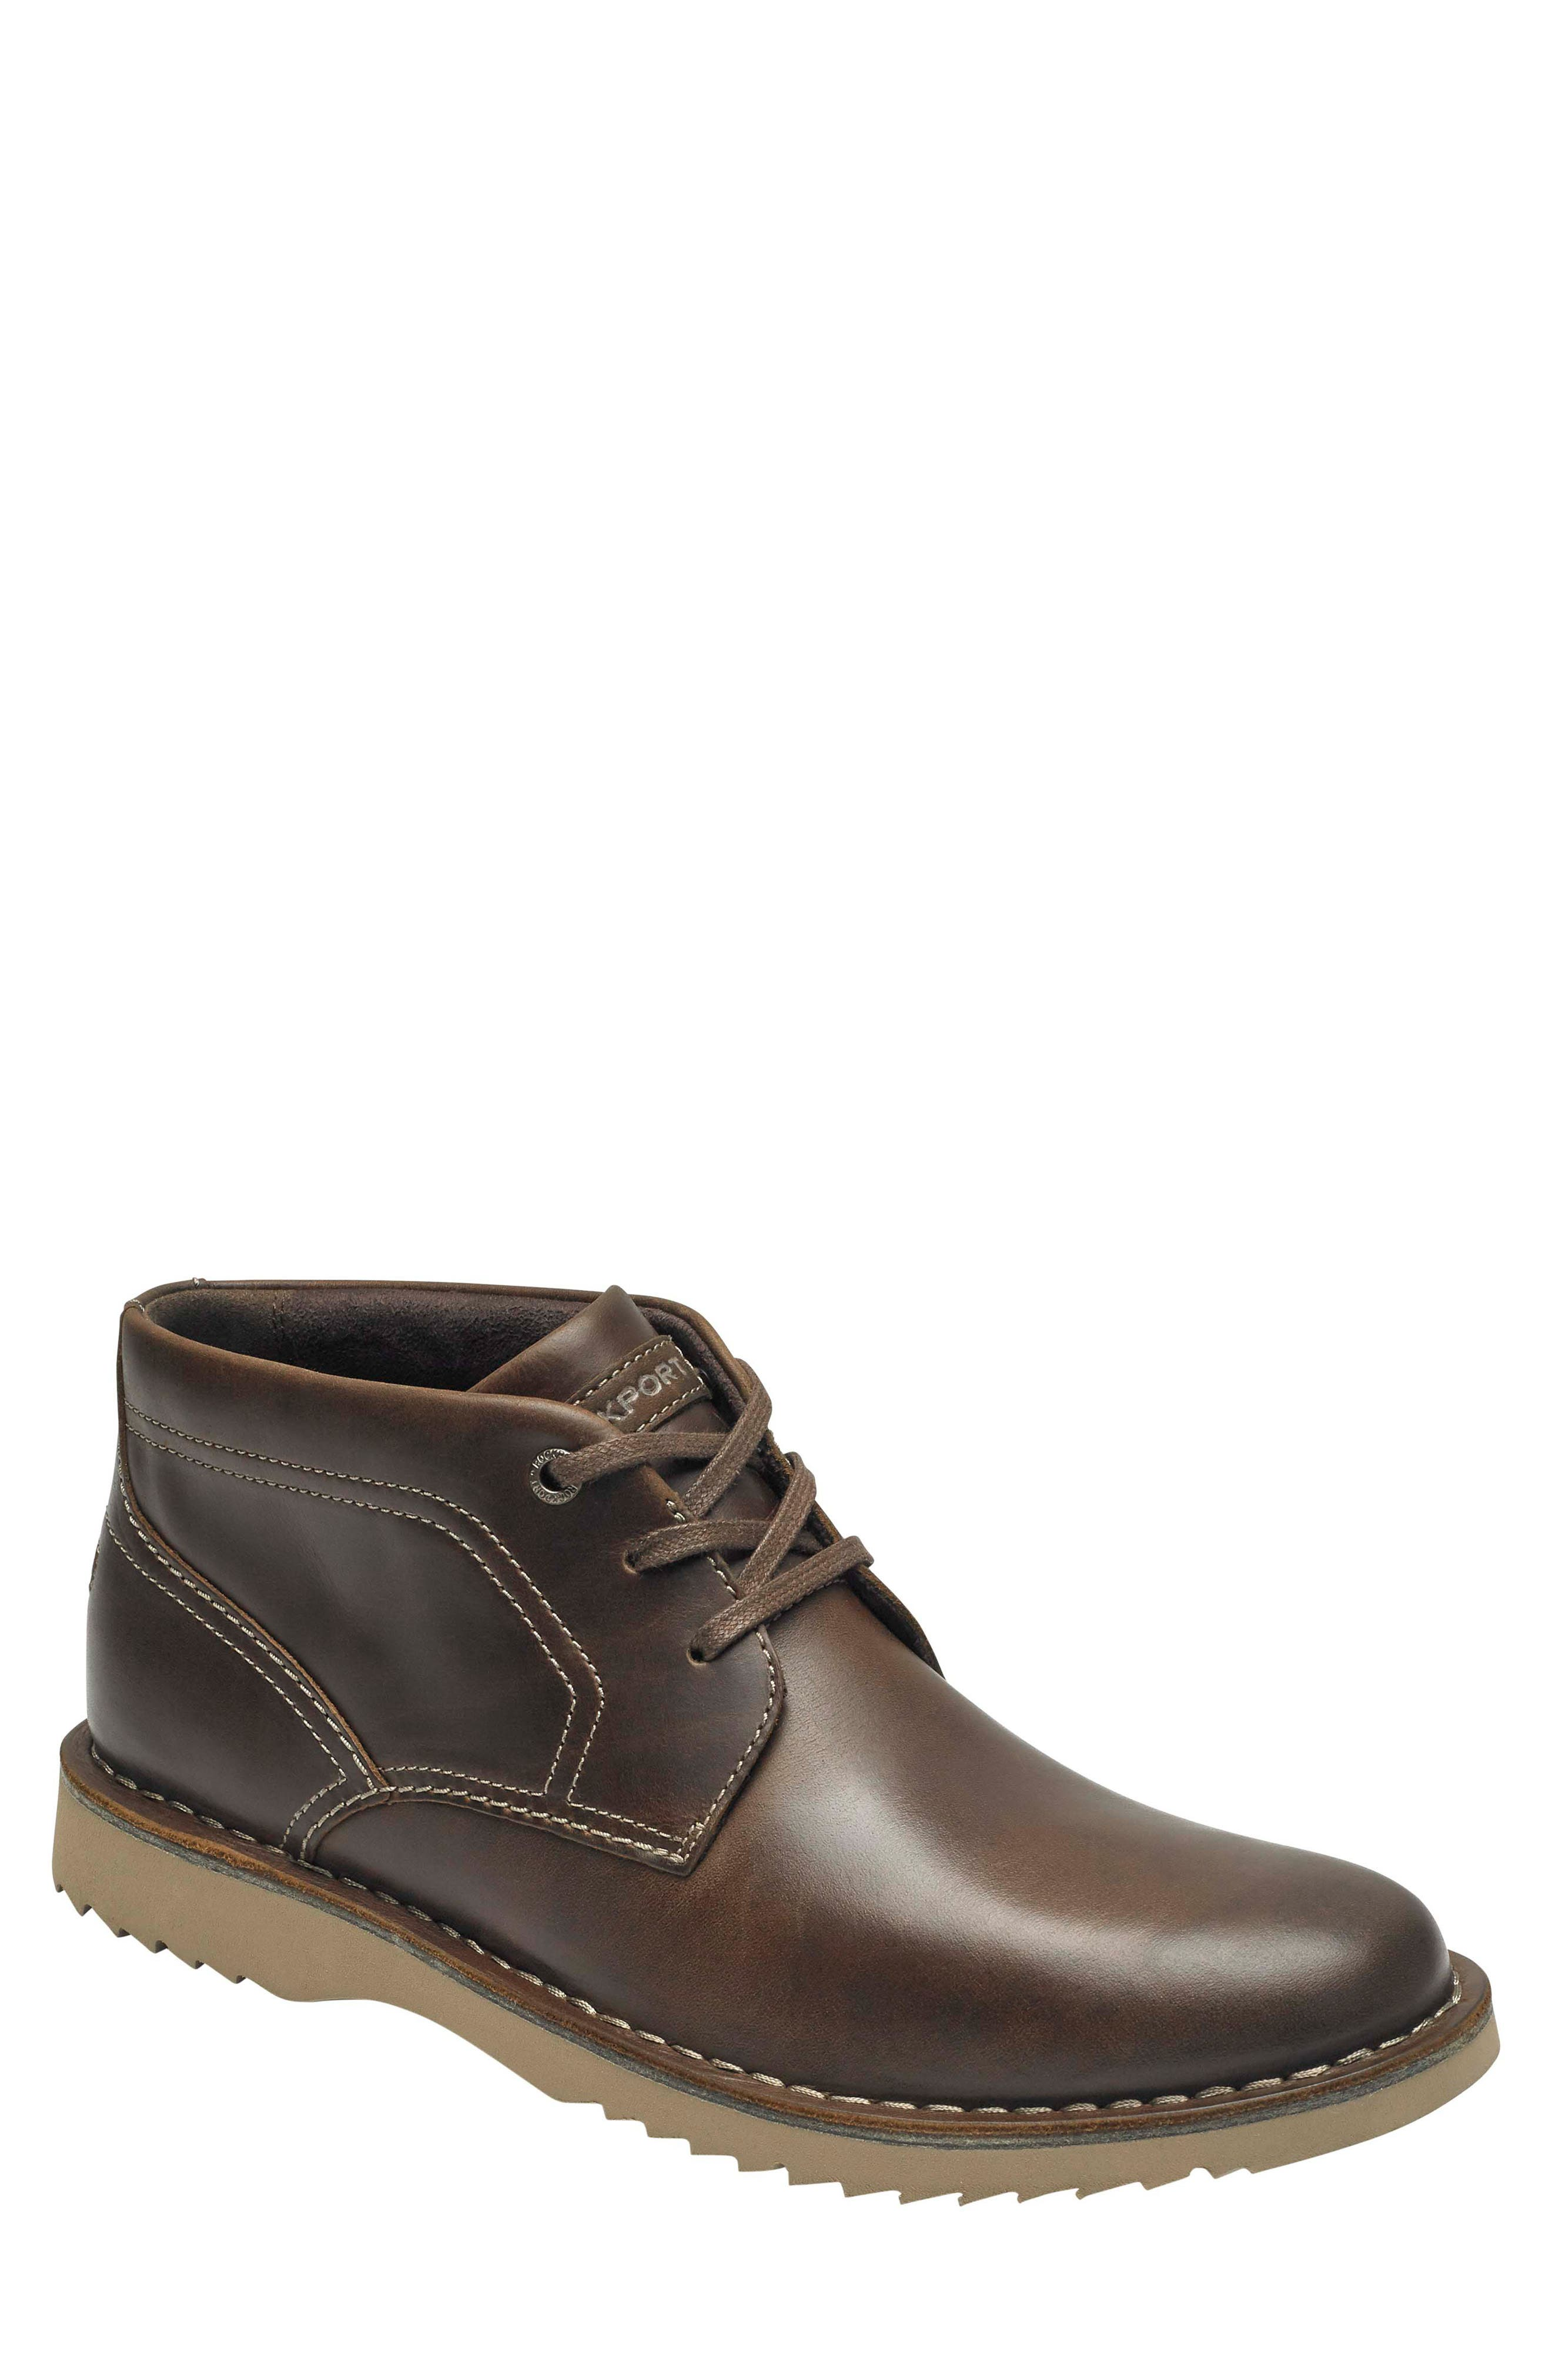 Rockport Cabot Chukka Boot, Brown